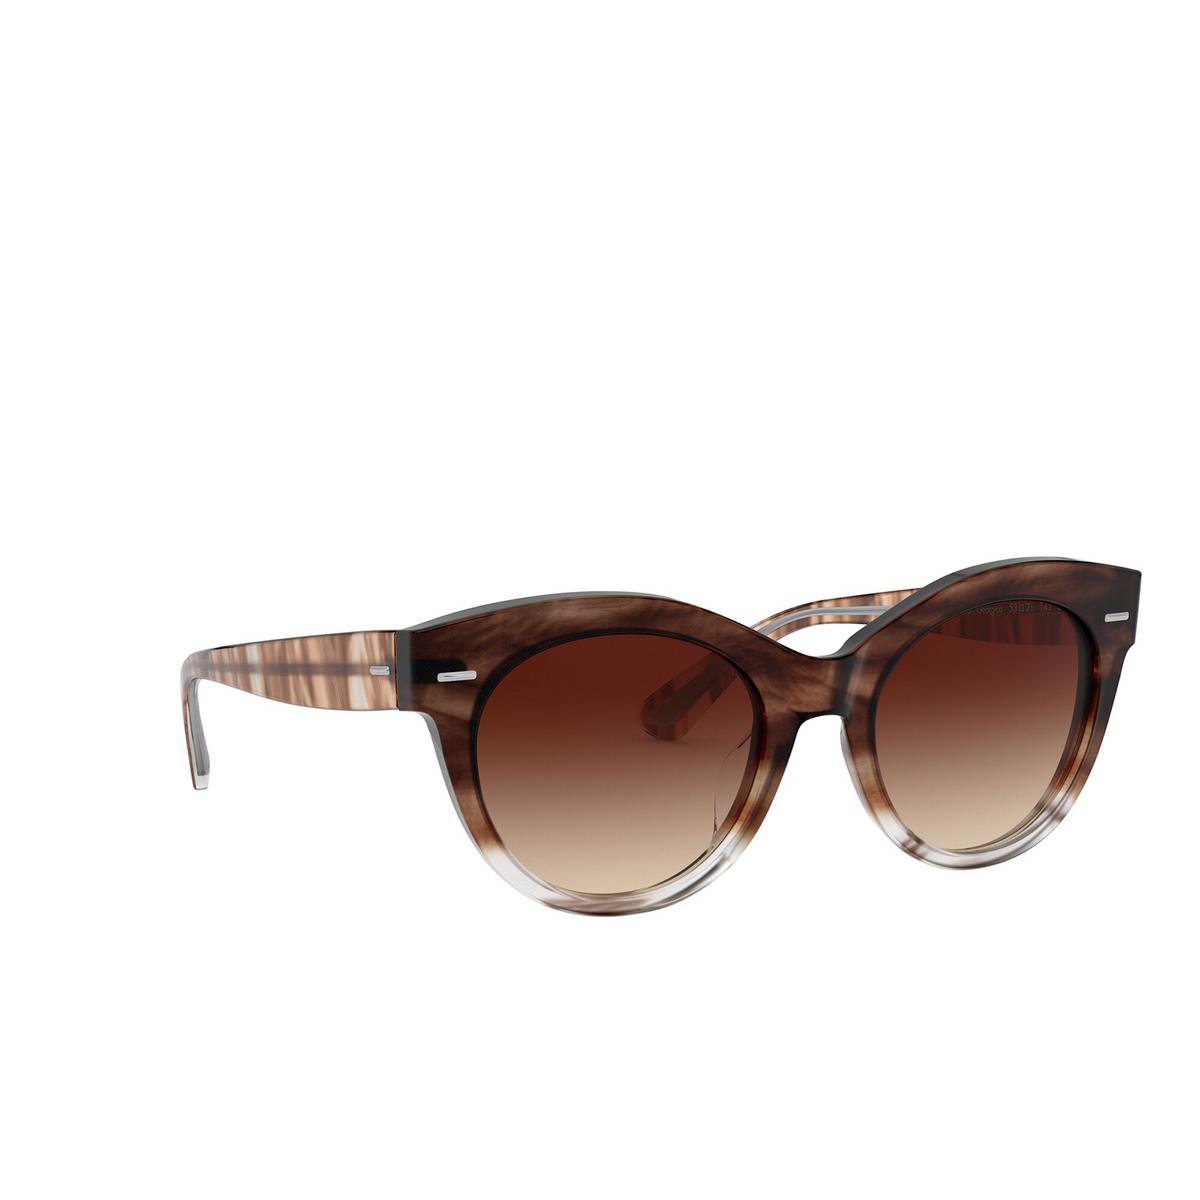 Oliver Peoples® Round Sunglasses: Georgica OV5421SU color Brick Ombre 168513 - three-quarters view.